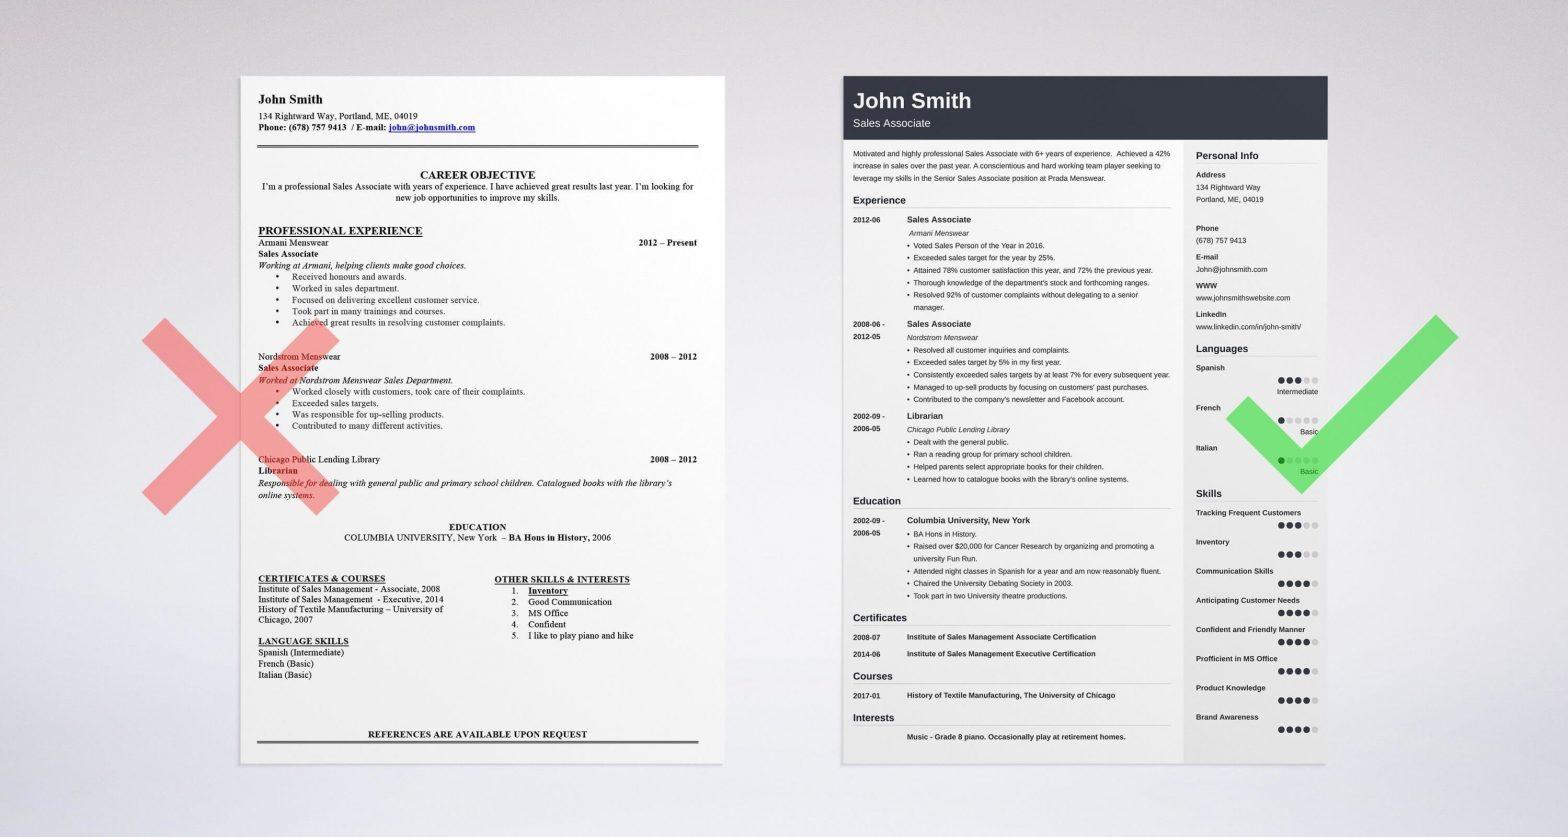 Sample Of About Me In Resume Professional Resume Summary Examples (25lancarrezekiq Statements)